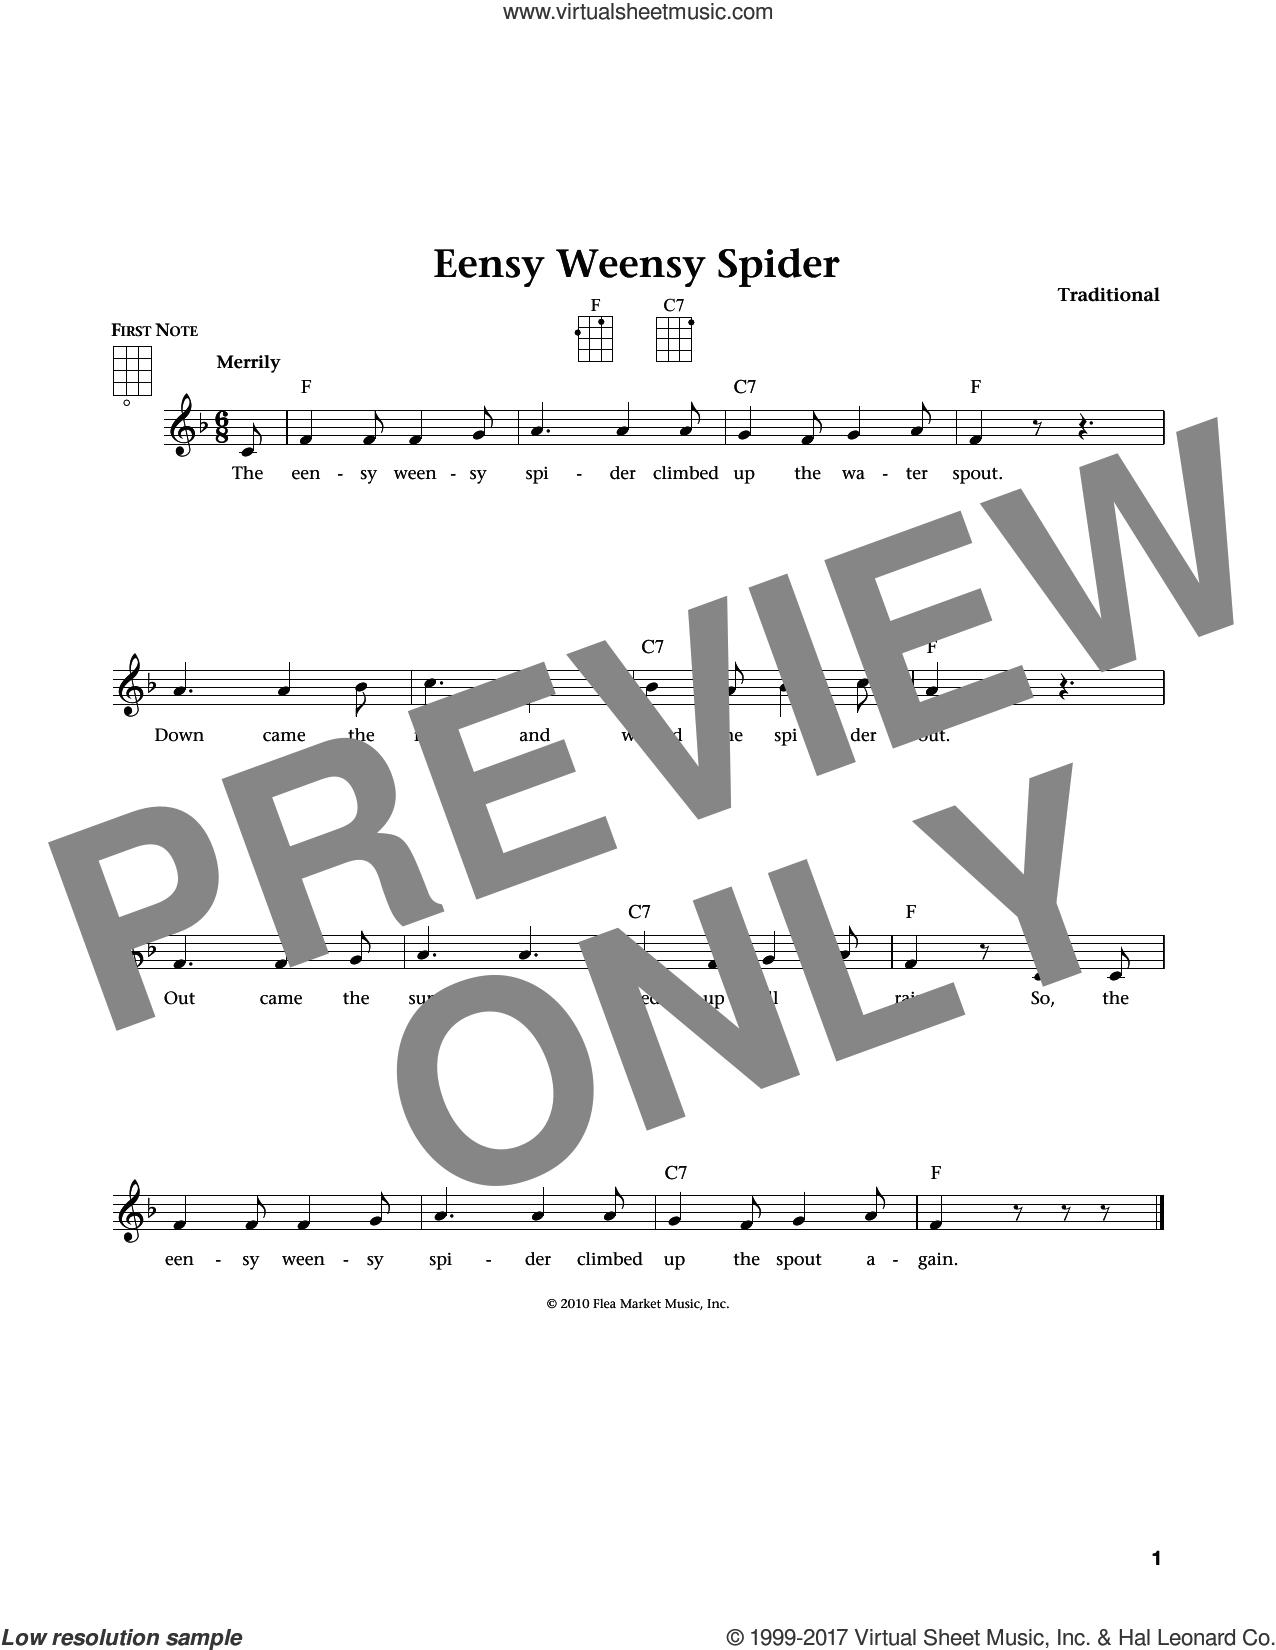 Eensy Weensy Spider (from The Daily Ukulele) (arr. Liz and Jim Beloff) sheet music for ukulele , Jim Beloff and Liz Beloff, intermediate skill level